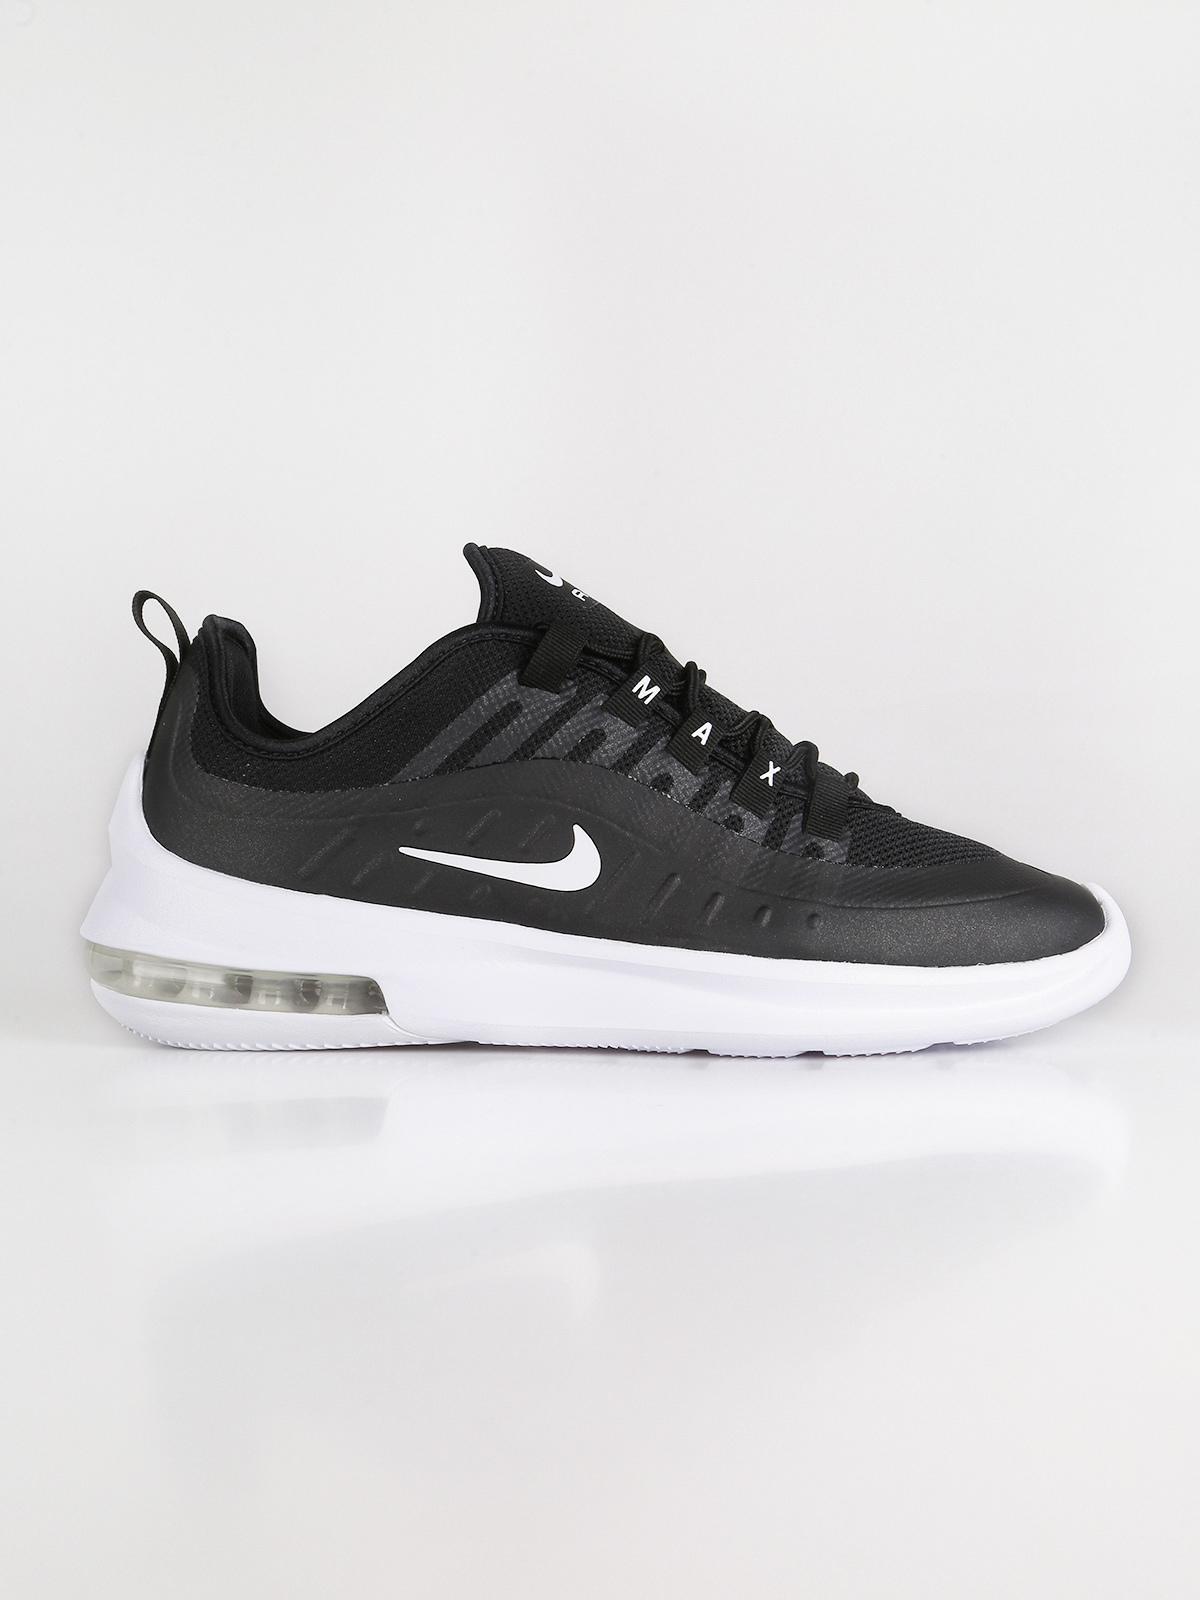 nike Air Max Axis sneakers sportive uomo | MecShopping